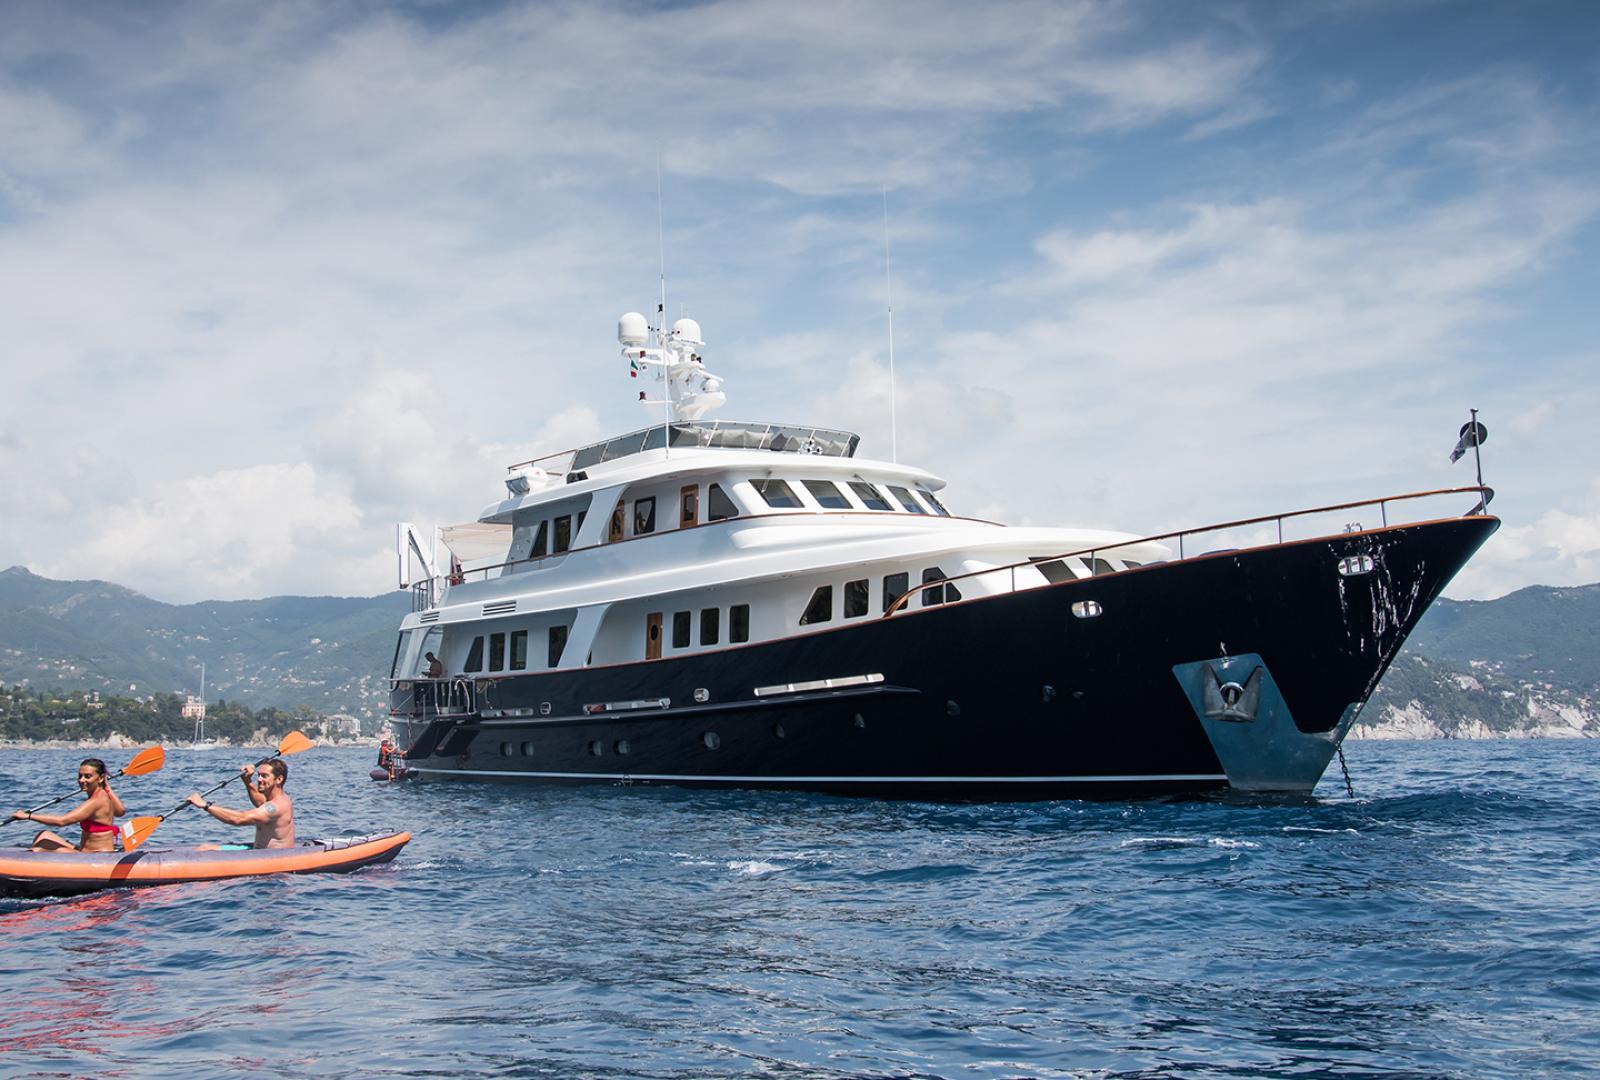 cbi navi de vries lentsch eleni motor yacht charter 10 guests mediterranean